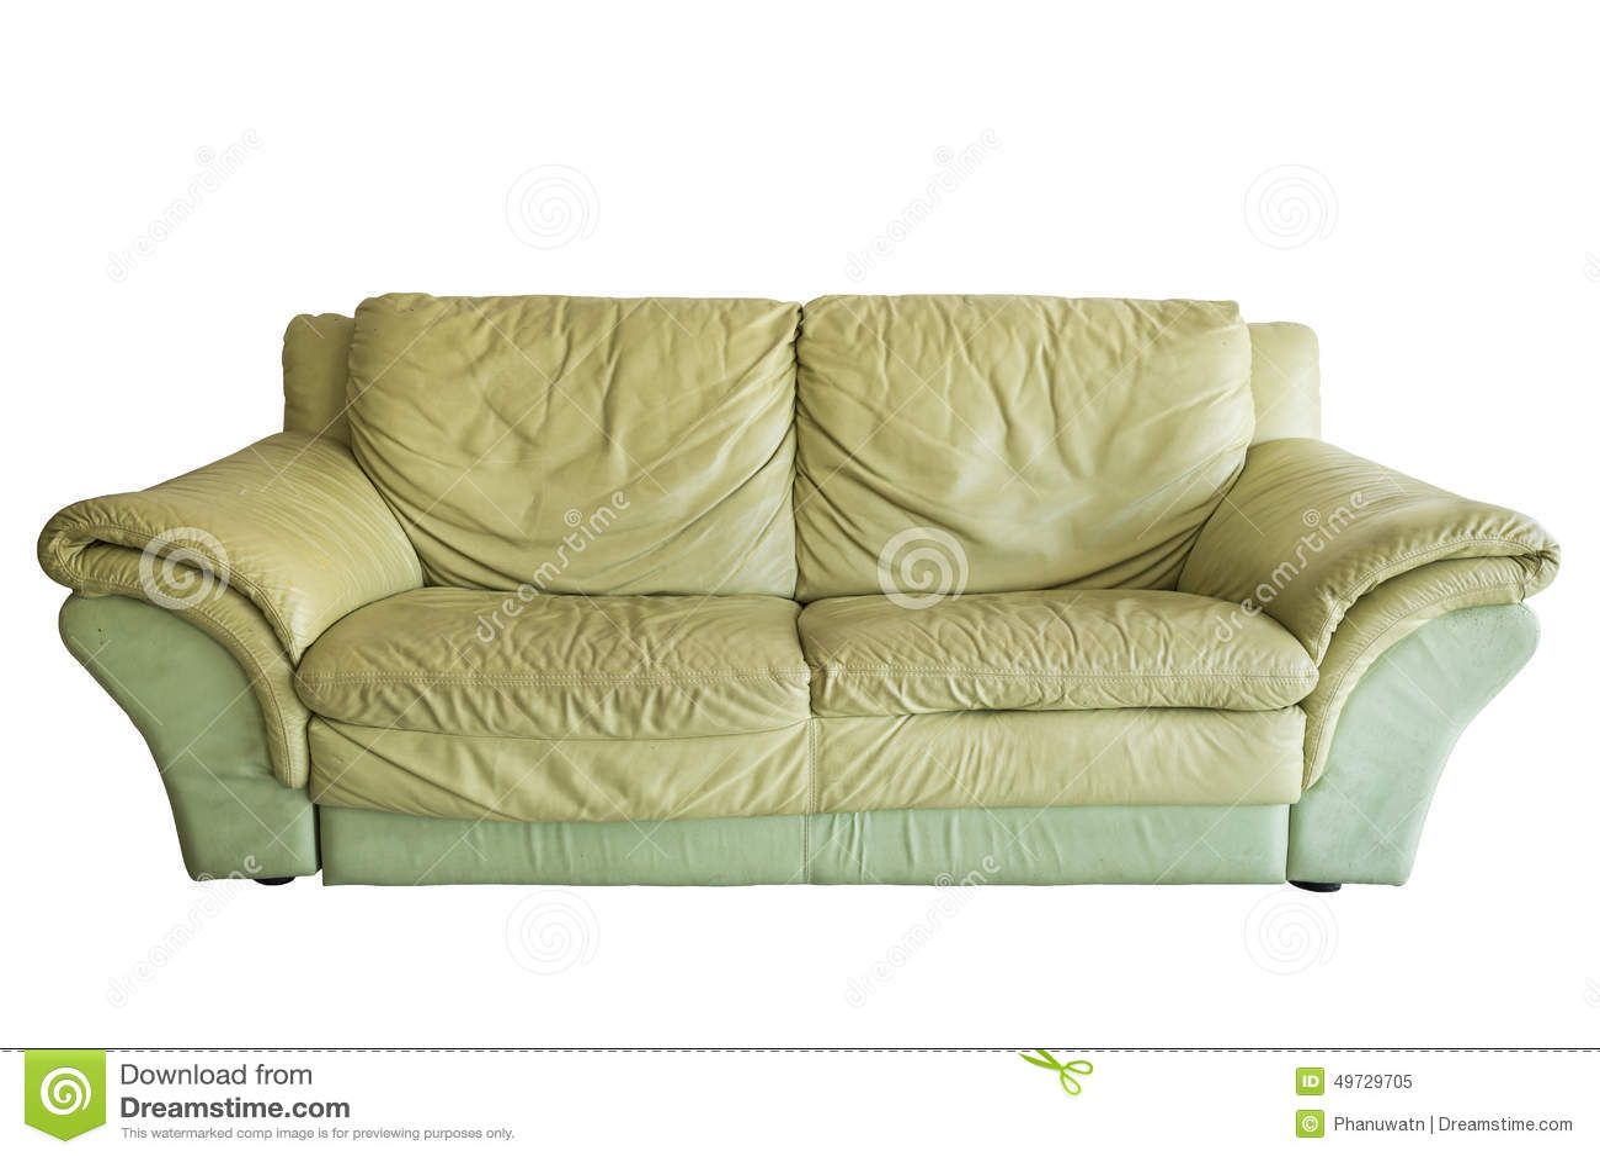 Old Sofa Green Old Sofa Stock Photo Image 49729705